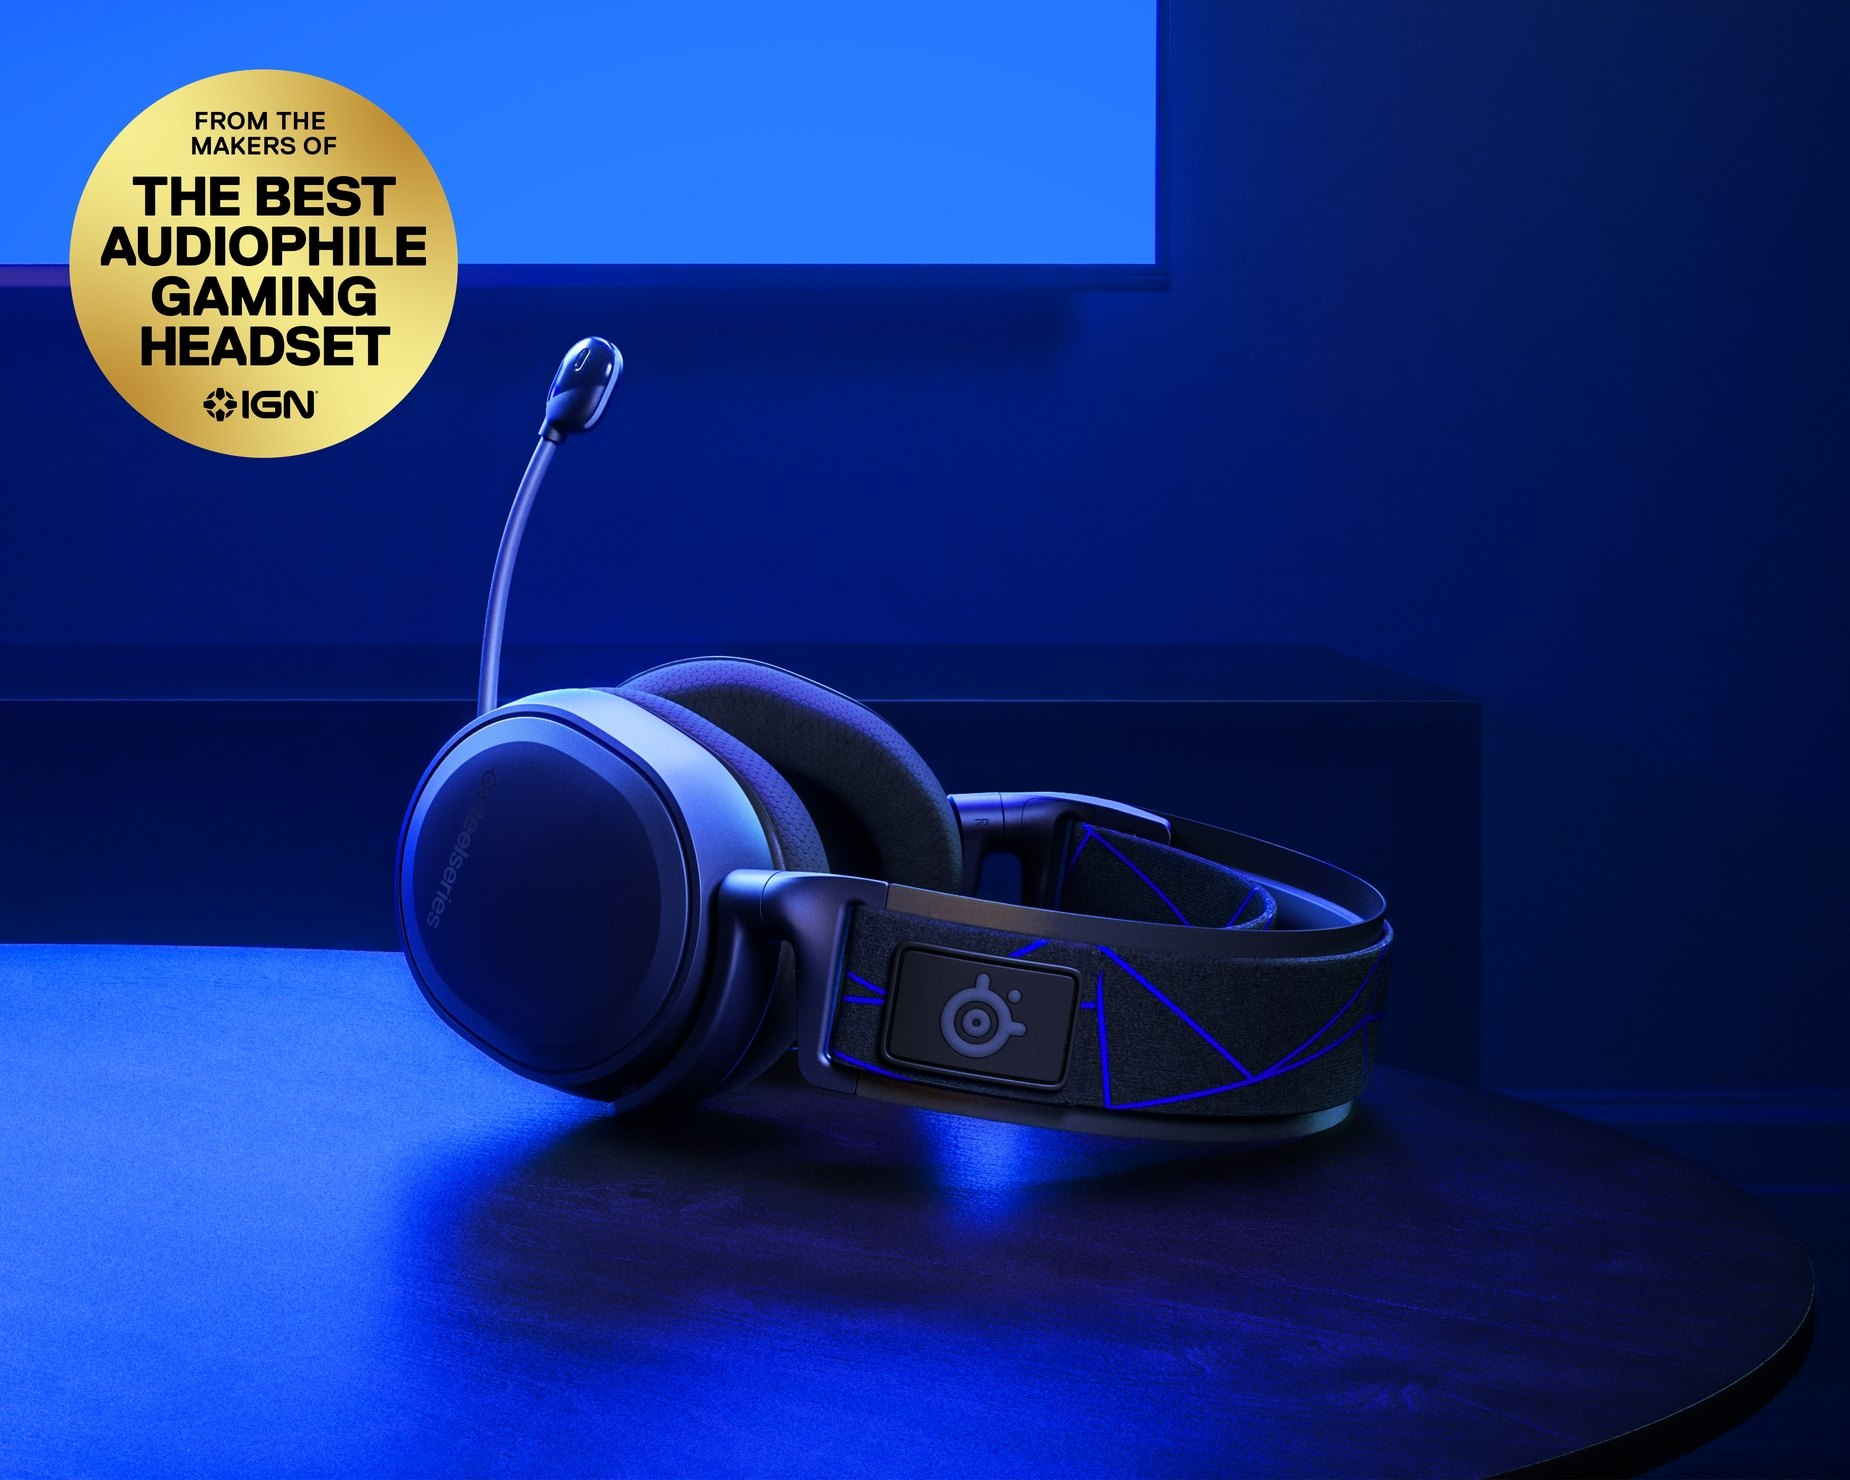 Arctis 7P耳機平放於桌面上並且麥克風呈現打開的位置。可以看到 PlayStation 的招牌色調。